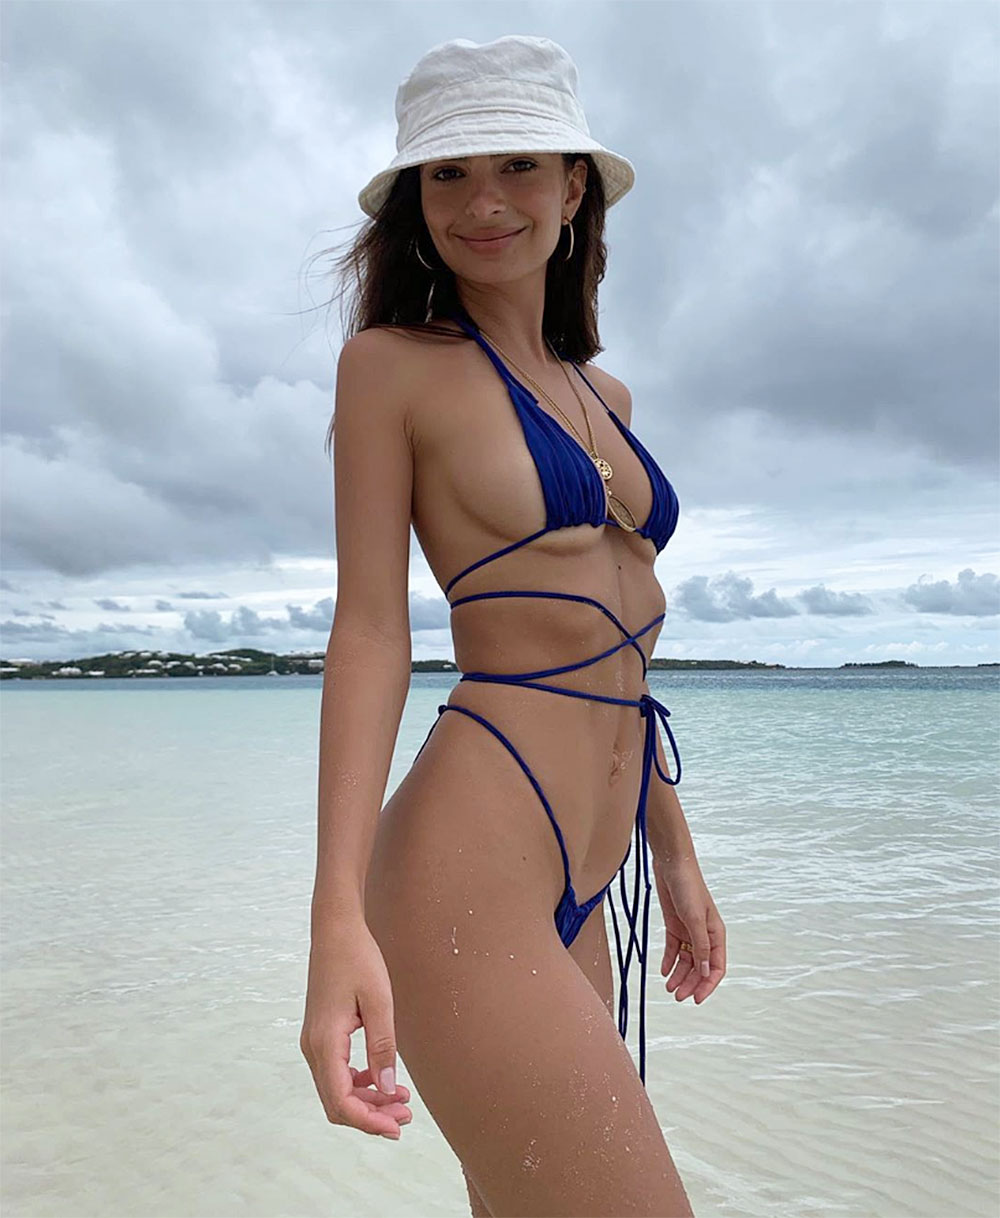 BeachBikiniSwimsuit Best Celebrity 2019Pics Of Bodies qRL5Aj34